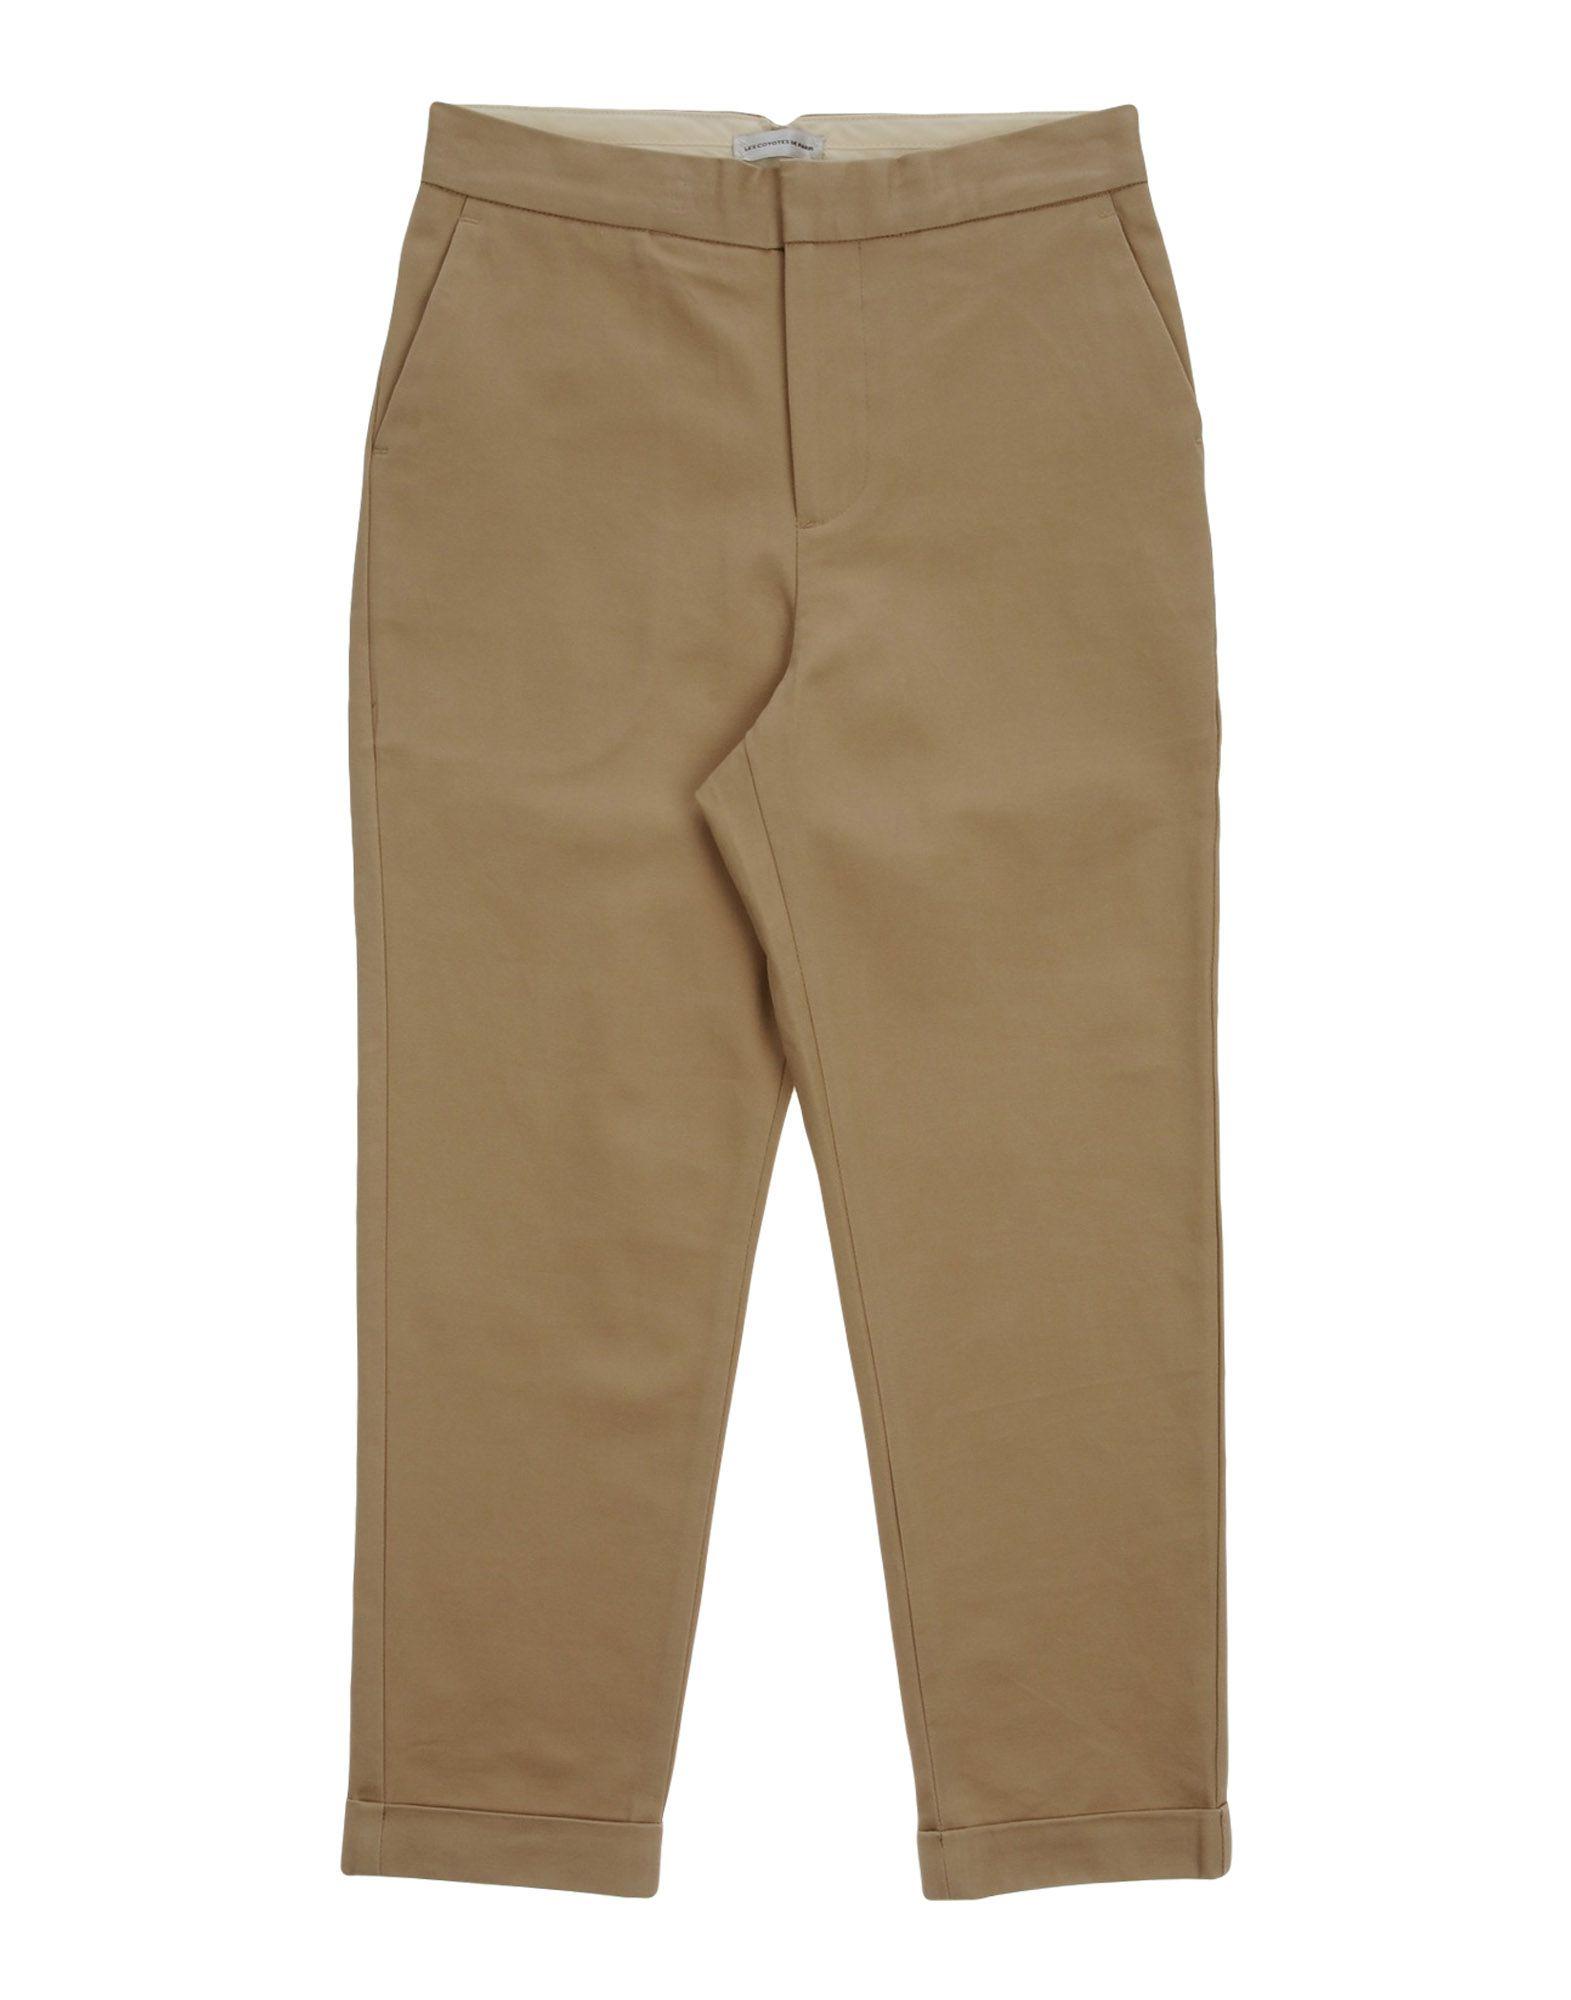 LES COYOTES DE PARIS Повседневные брюки les prairies de paris повседневные шорты